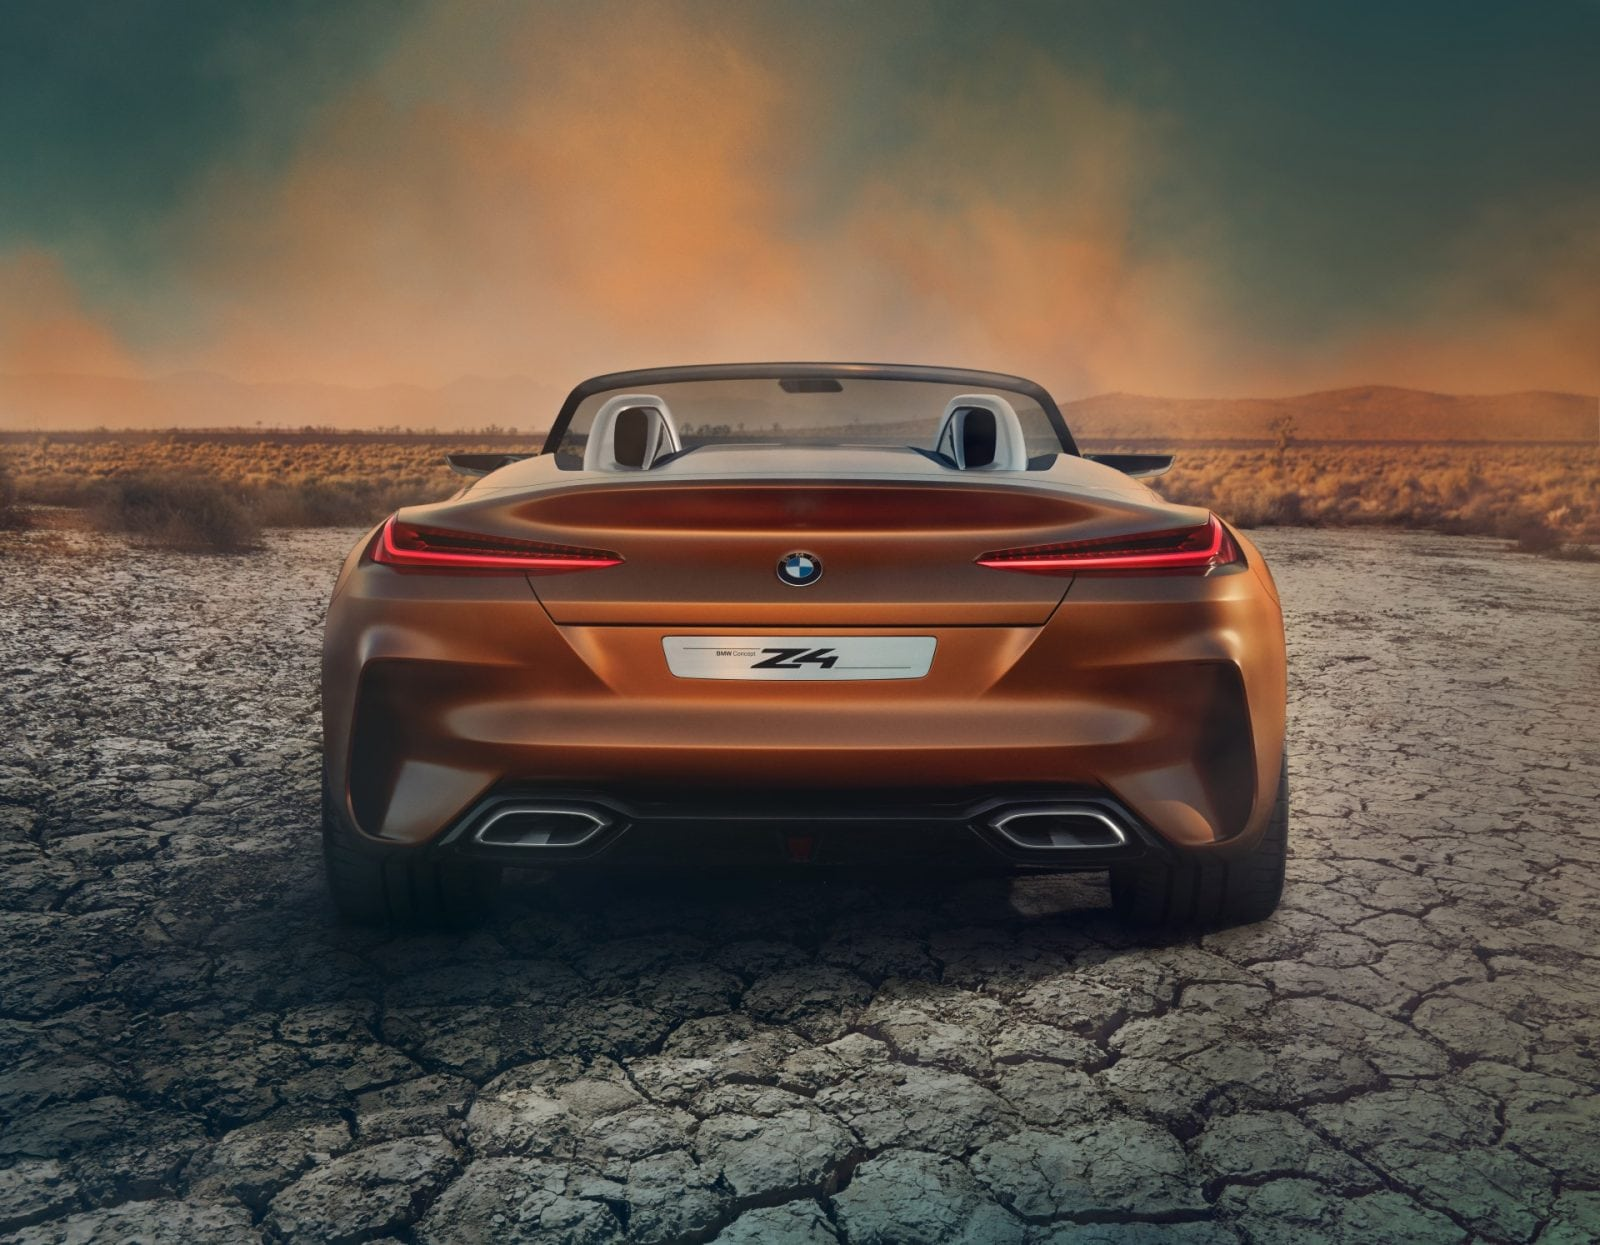 BMW Z4 CBMW Z4 Concept 2017 Design Official Photosetoncept 2017 Design Official Photoset